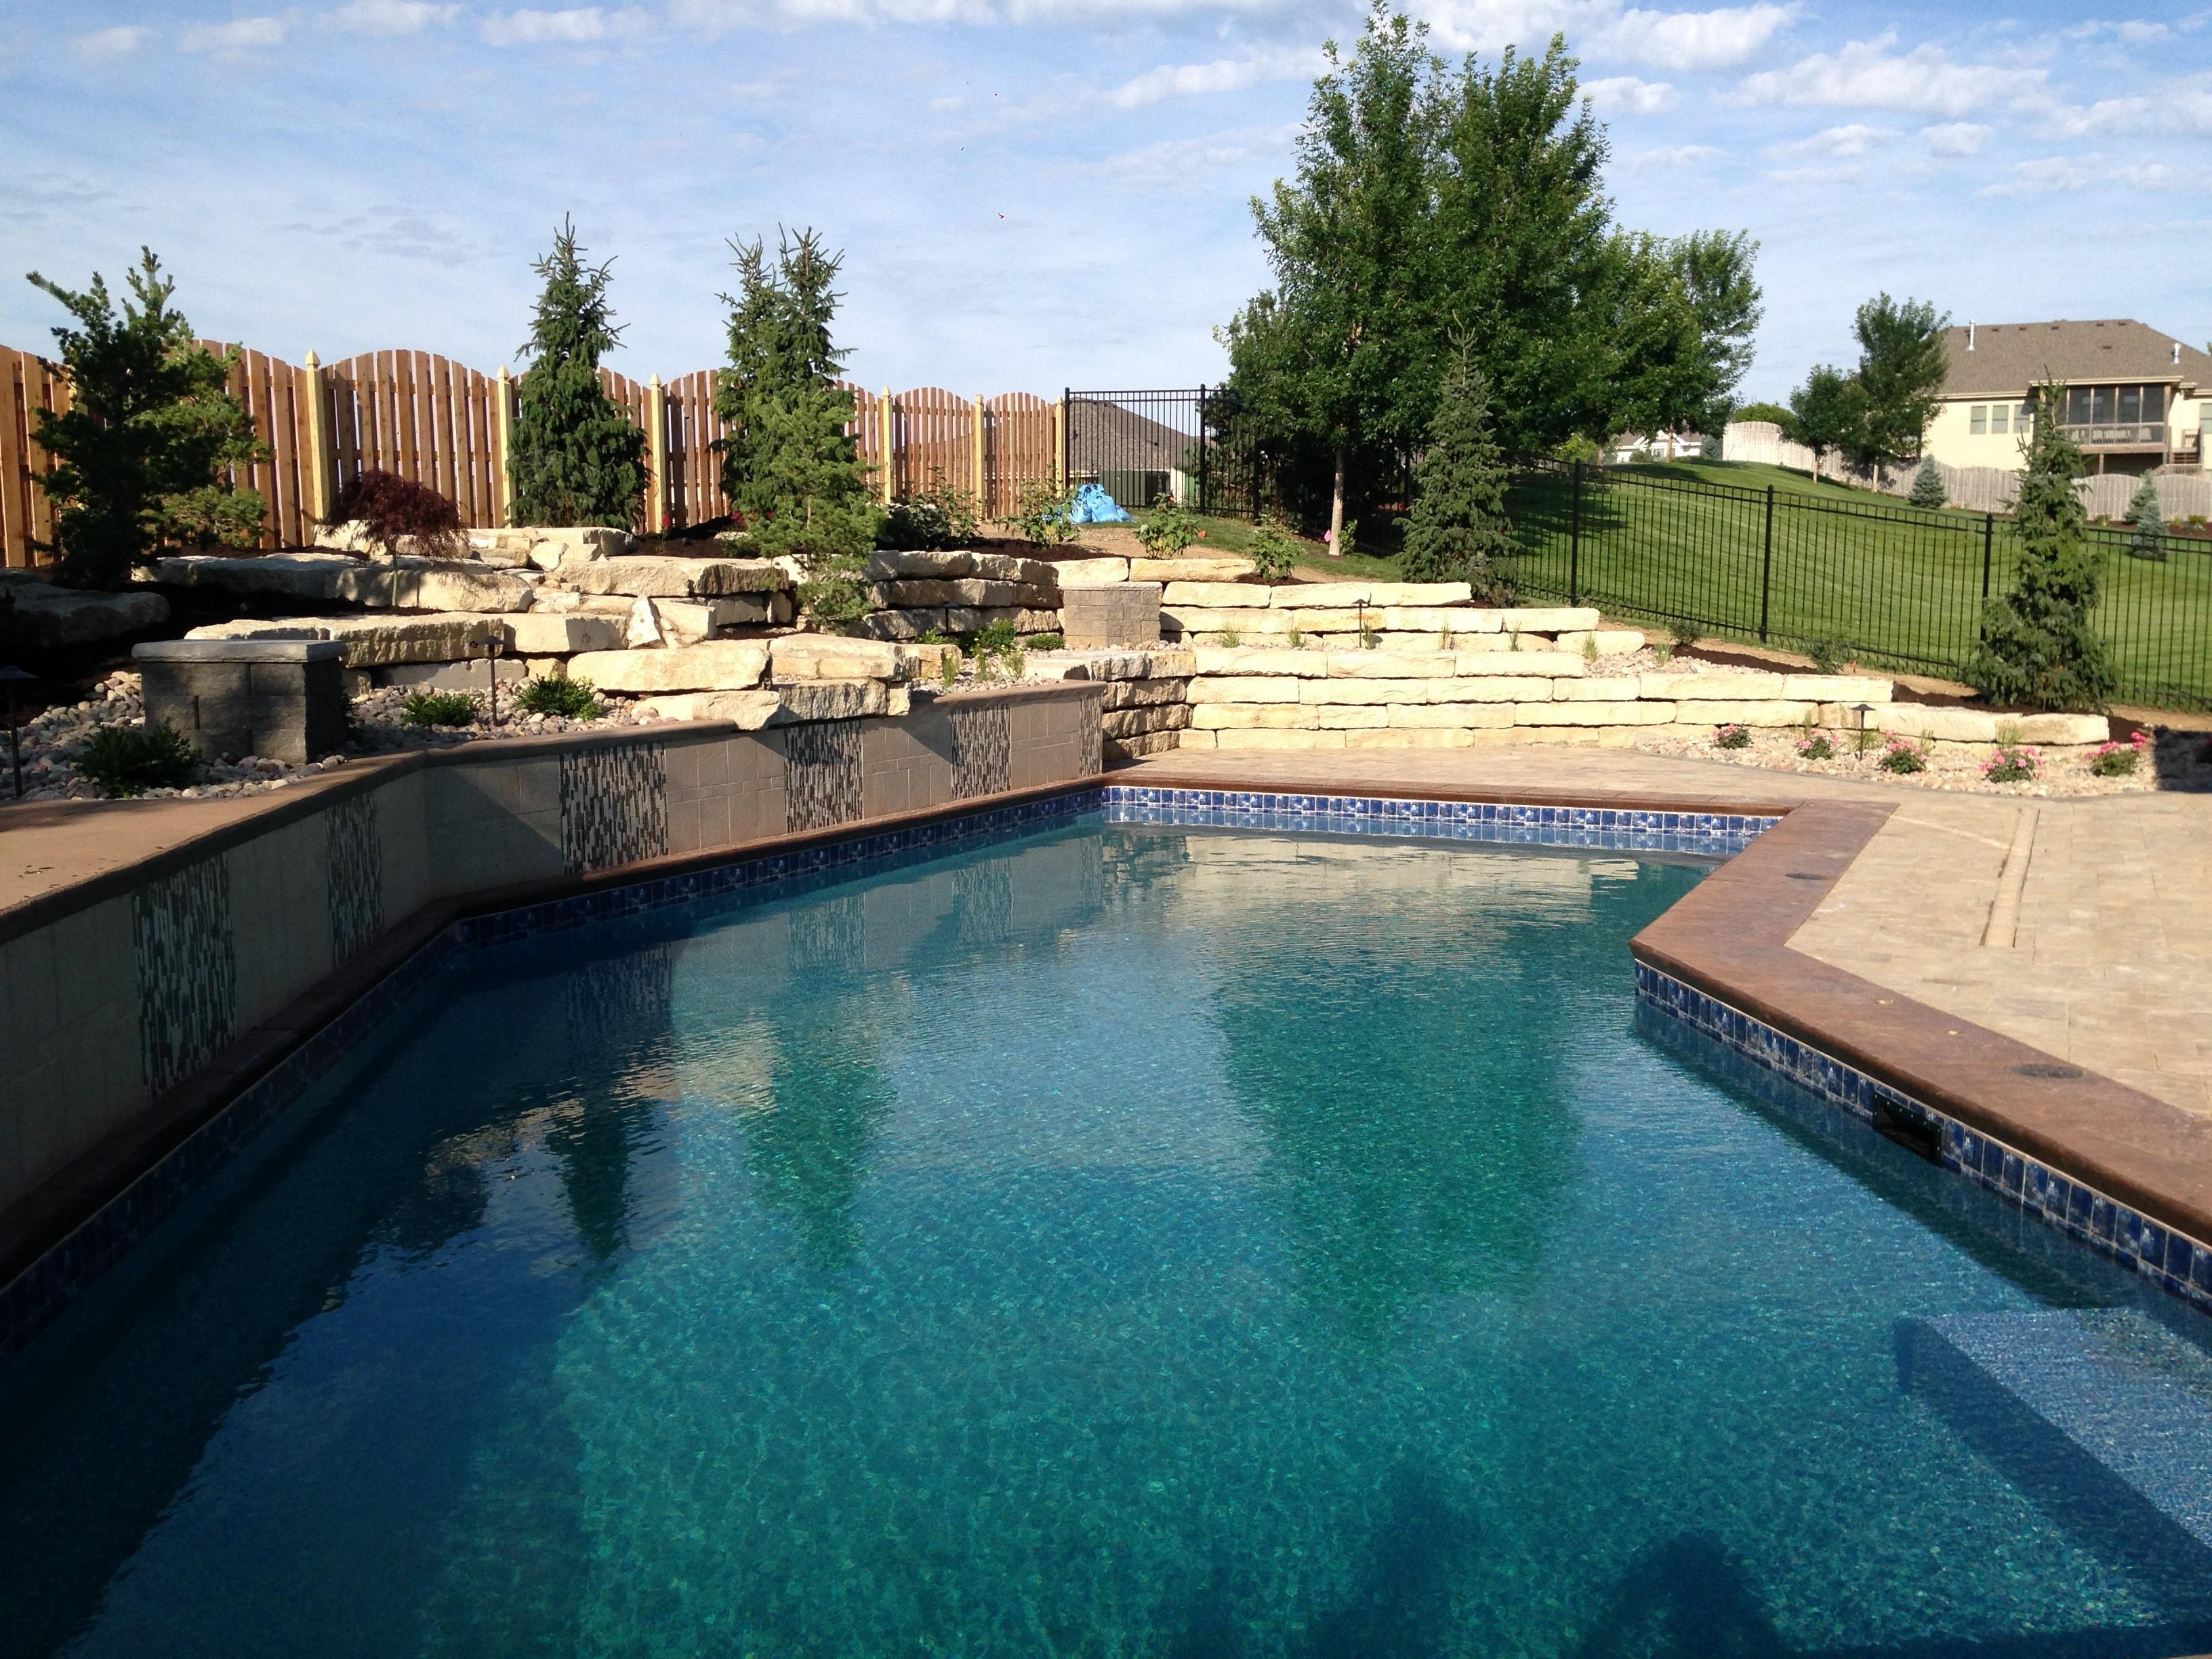 Omaha Pool Design | Renovations | Builder | Artisan Pools - Omaha, NE